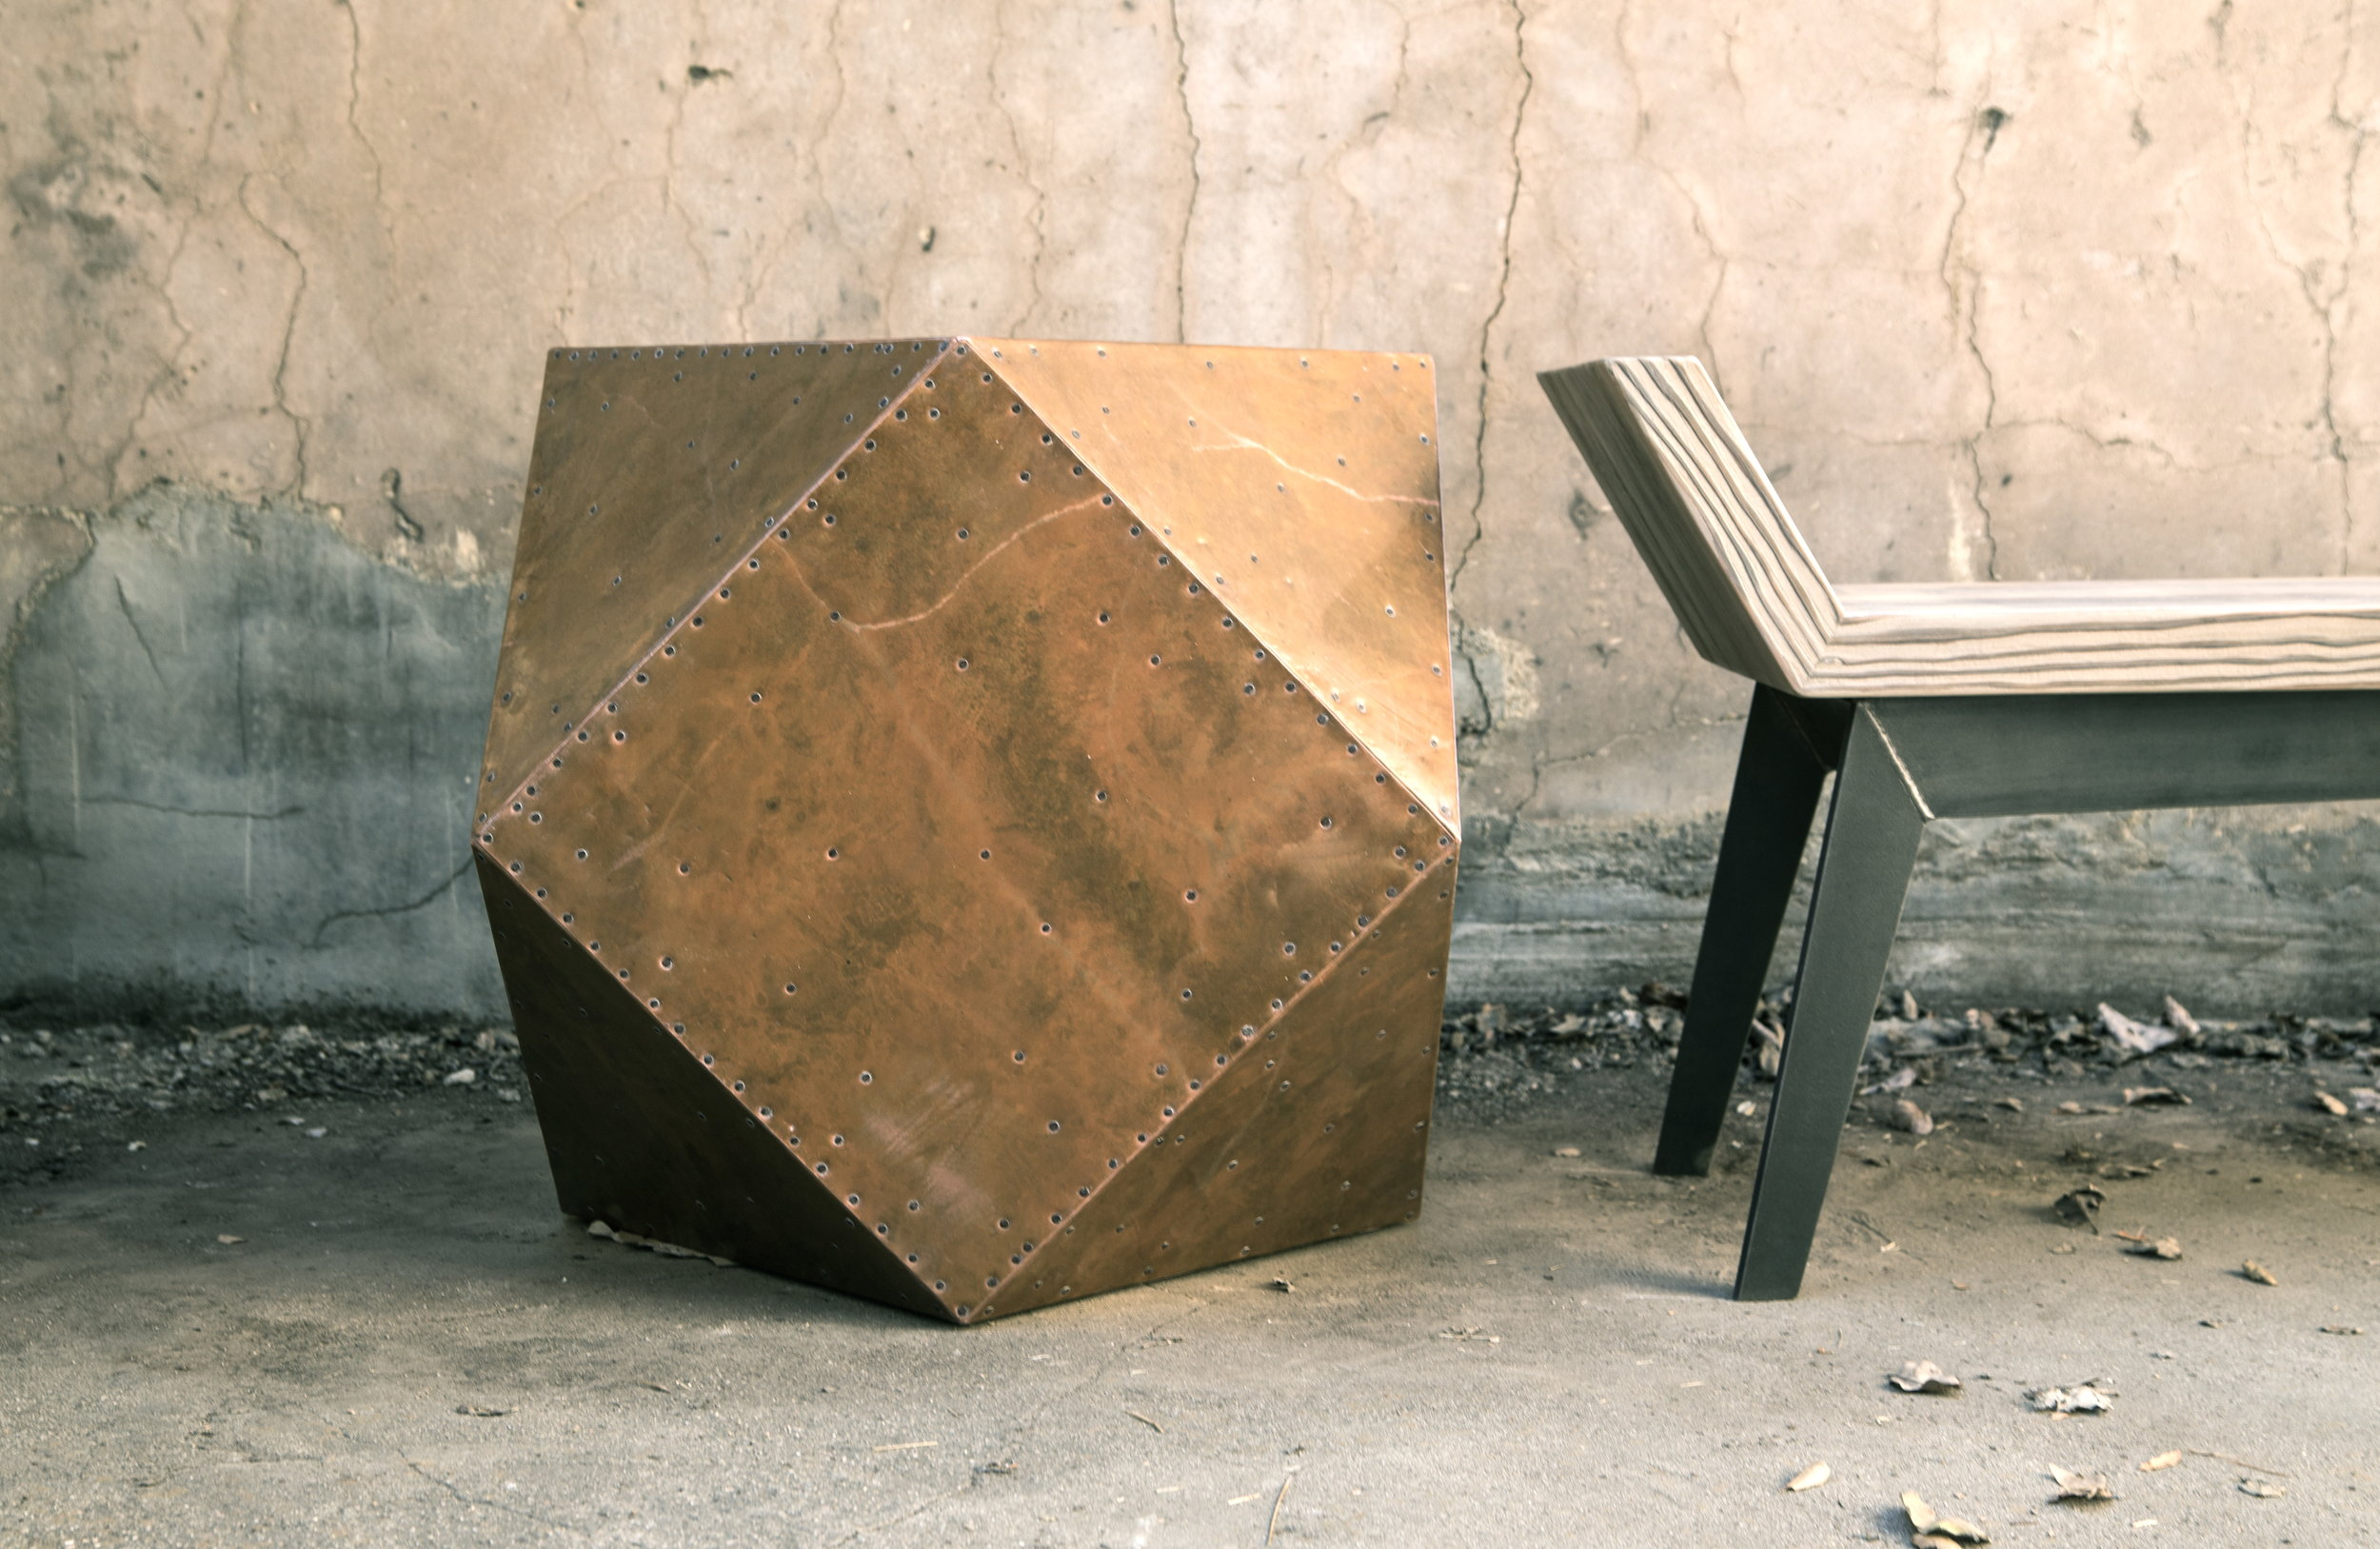 ben-riddering-cubodron-collection